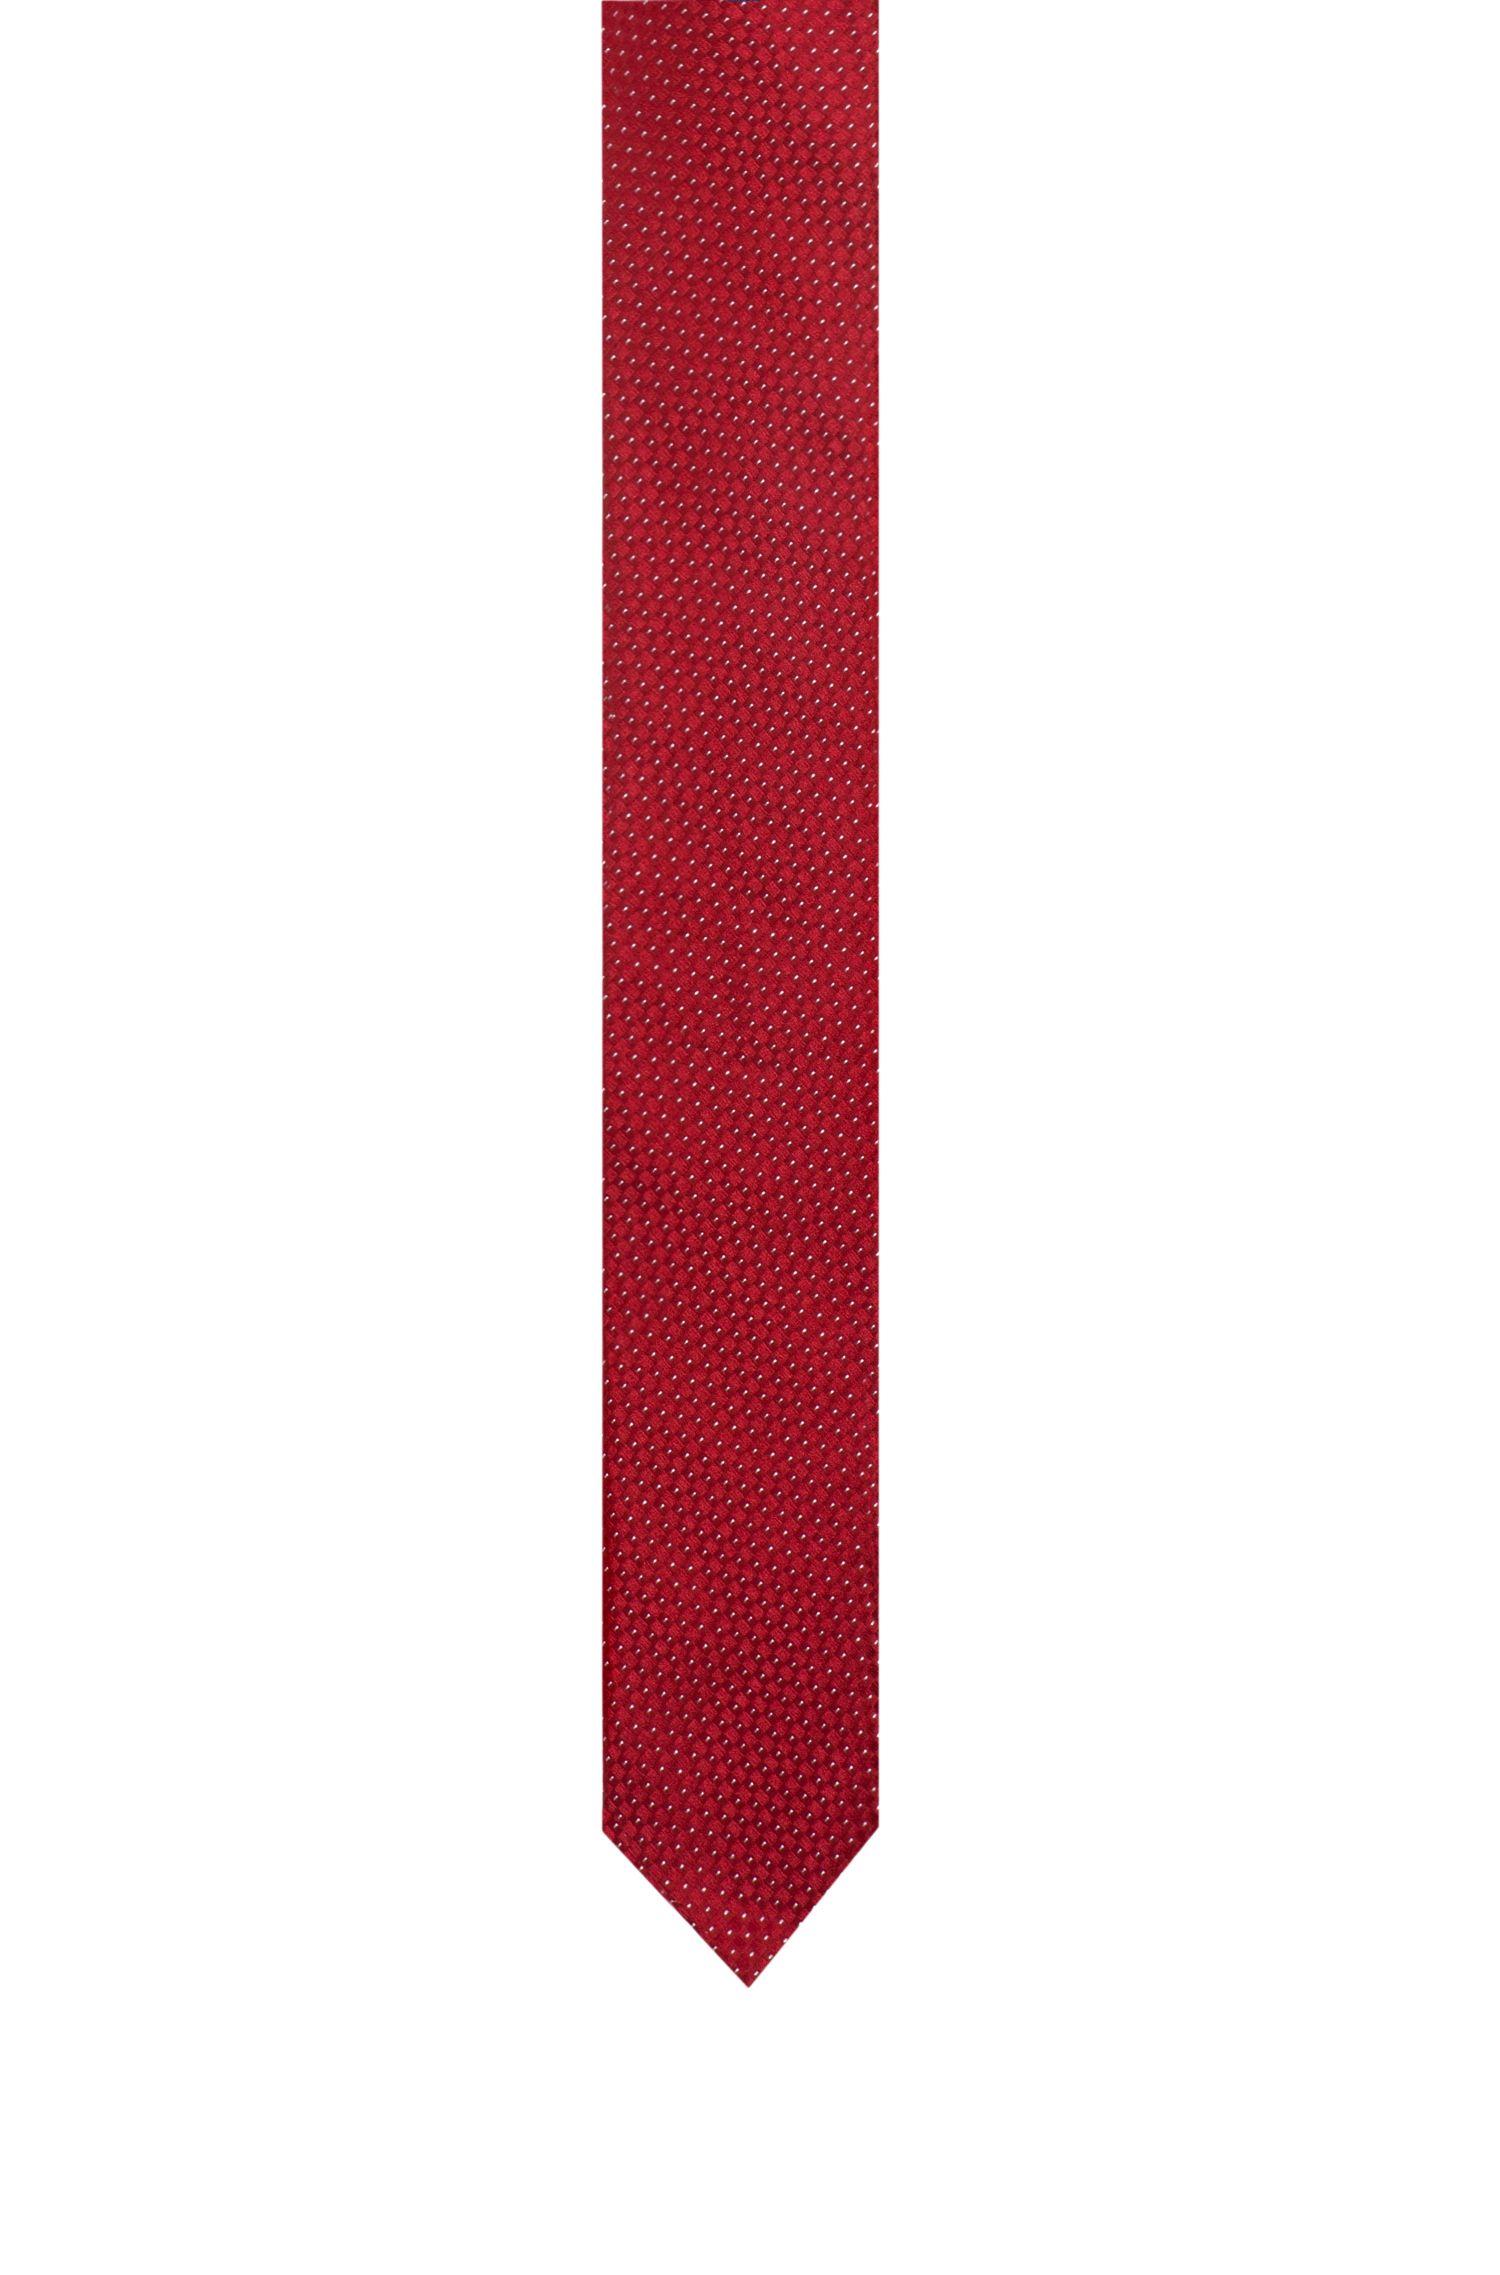 Krawatte aus Seiden-Jacquard mit filigranem Muster